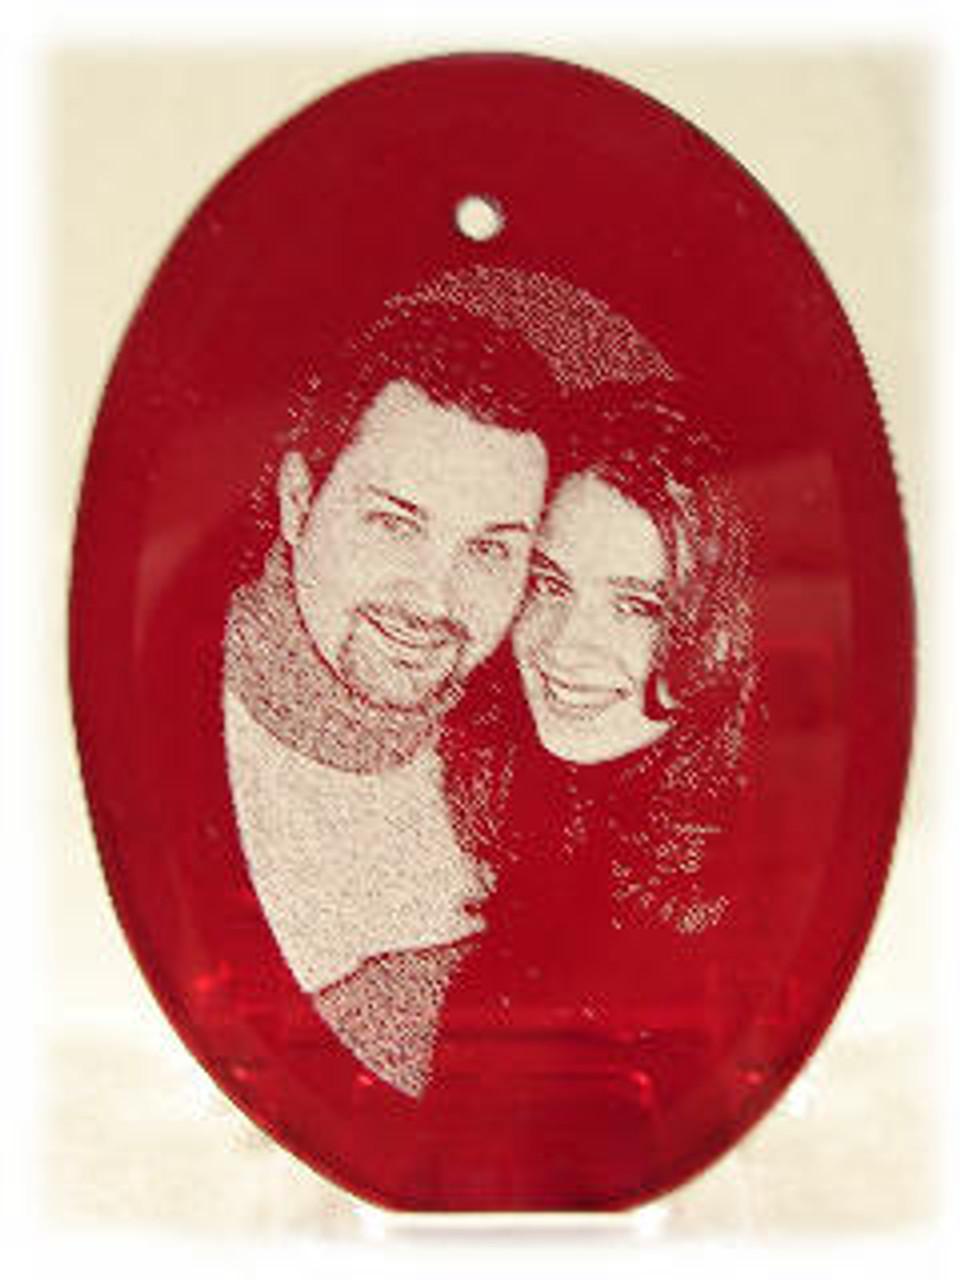 Red Crystal Beveled Oval Shape Ornament with Velvet Bag